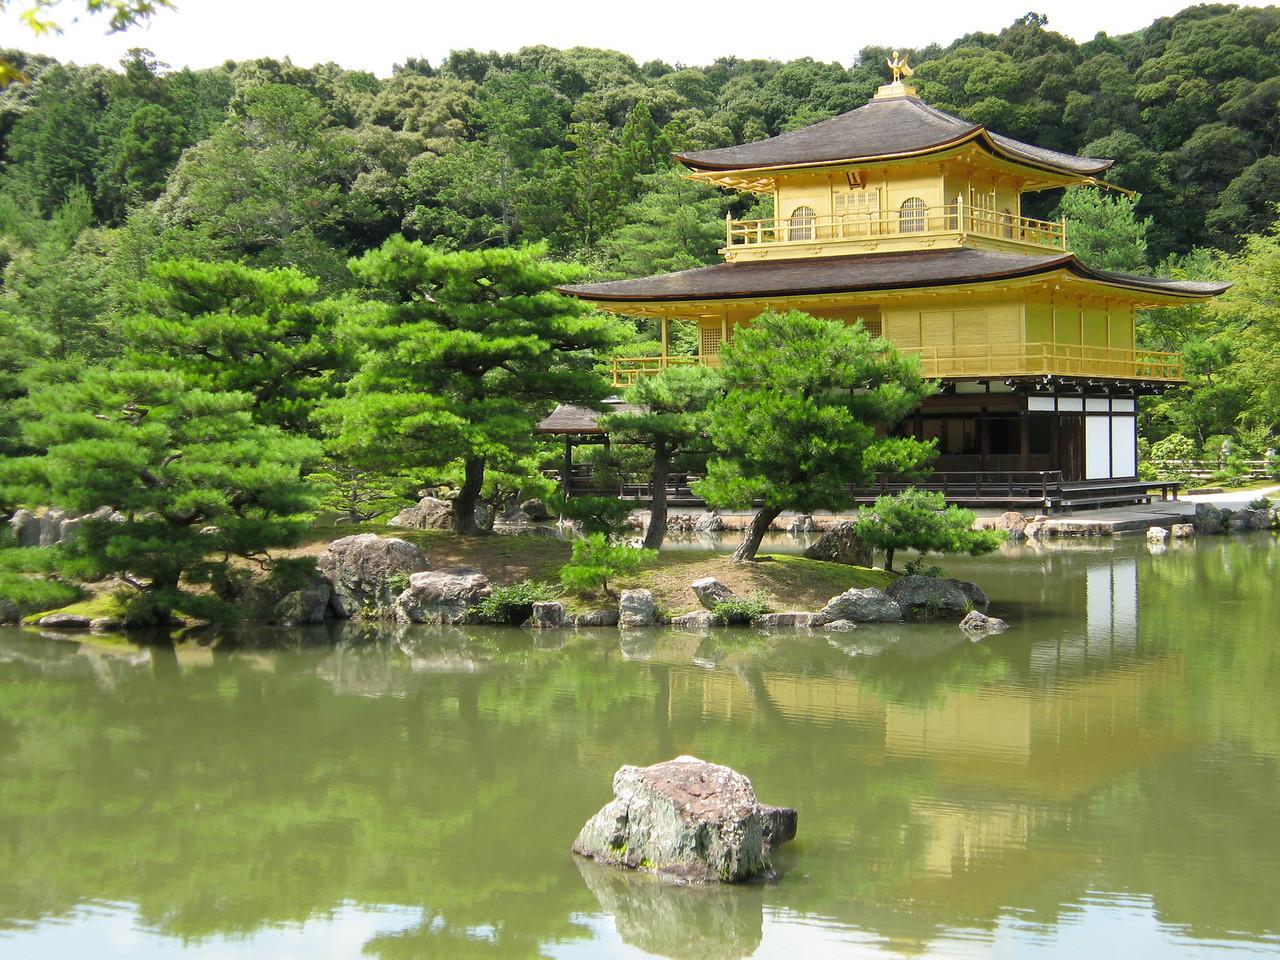 "63. Golden Pavillion (KinkaKuji)<br /> <br /> Kinkakuji Gallery<br /> <a href=""http://rishiray.smugmug.com/gallery/3169743#174325099"">http://rishiray.smugmug.com/gallery/3169743#174325099</a><br /> <br /> Hillman Wonders Page<br /> <a href=""http://www.hillmanwonders.com/golden_pavilion/golden_pavilion.htm#_vtop"">http://www.hillmanwonders.com/golden_pavilion/golden_pavilion.htm#_vtop</a>"